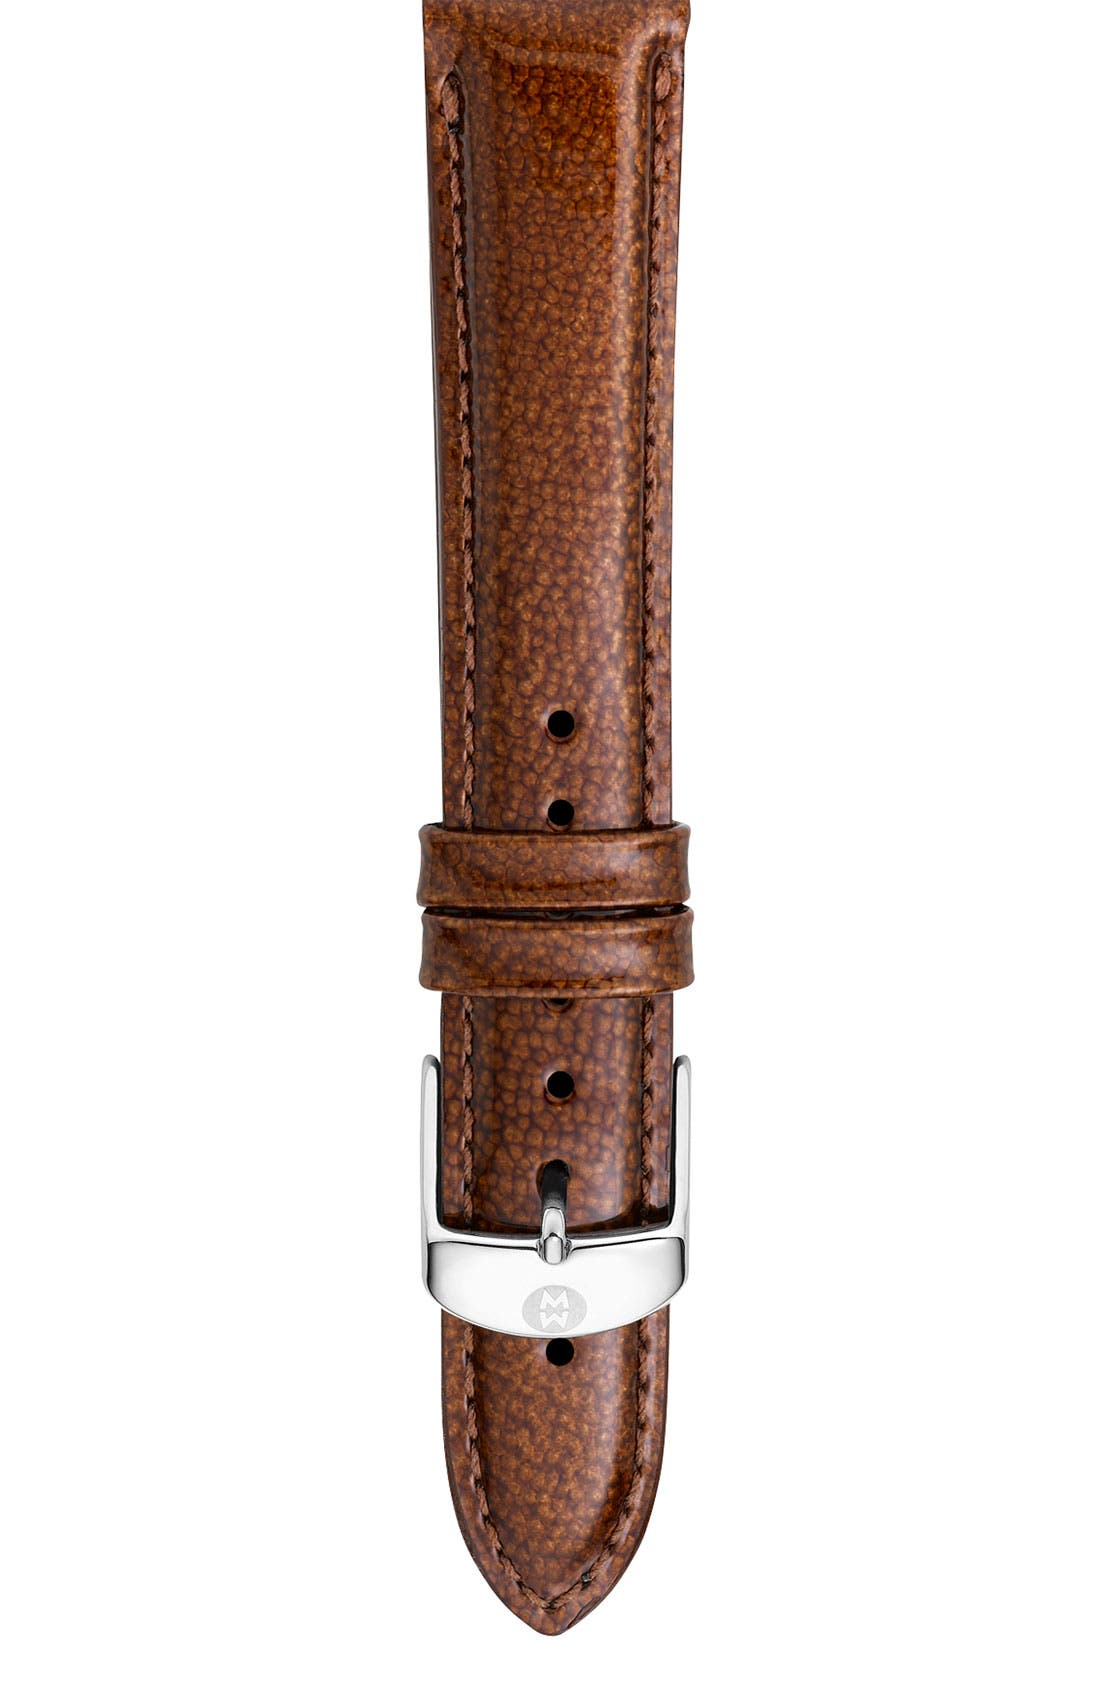 Main Image - MICHELE 'Deco Diamond' Diamond Dial Watch Case & 18mm Safari Patent Leather Strap